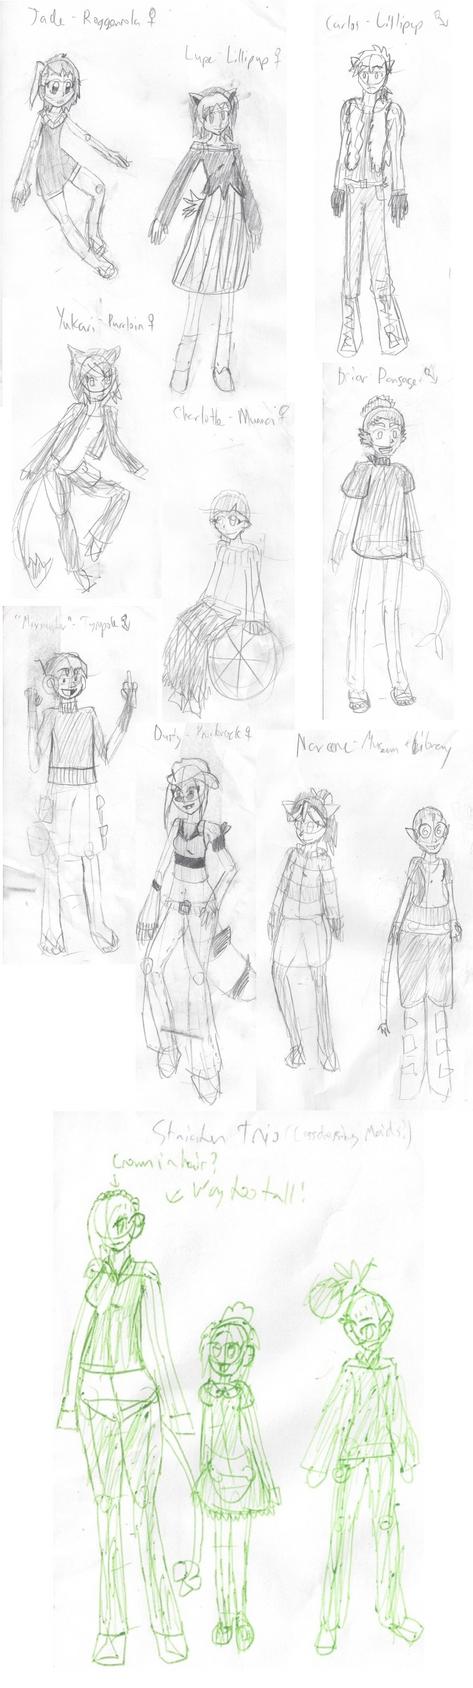 January 2015 Sketch Dump by Kittycara